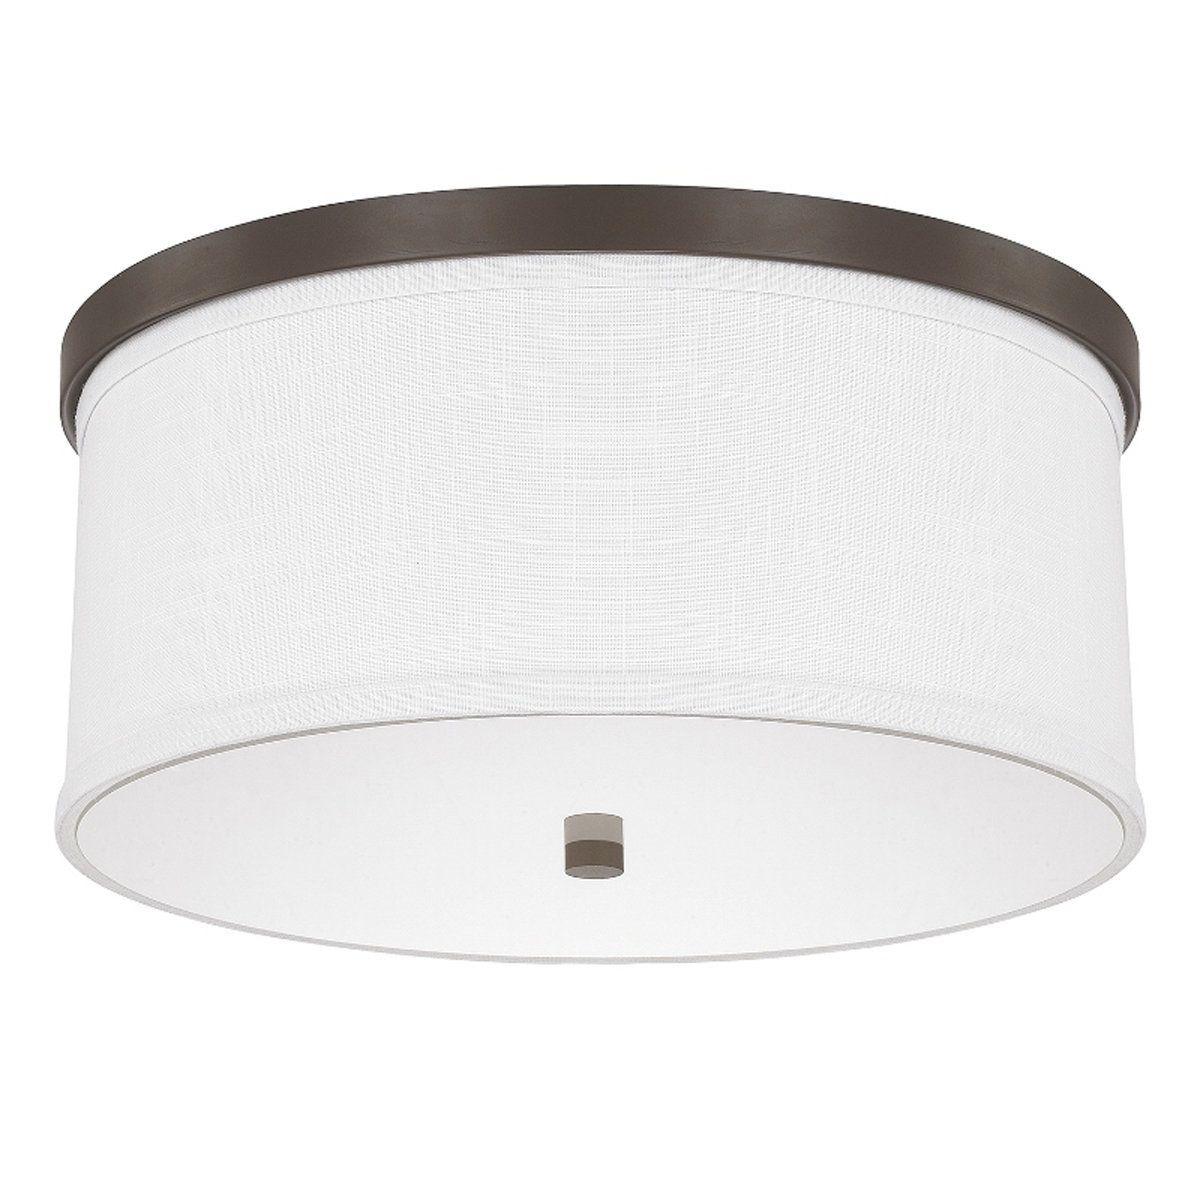 Springfield Linen Shade Ceiling Light Ceiling Lights Capital